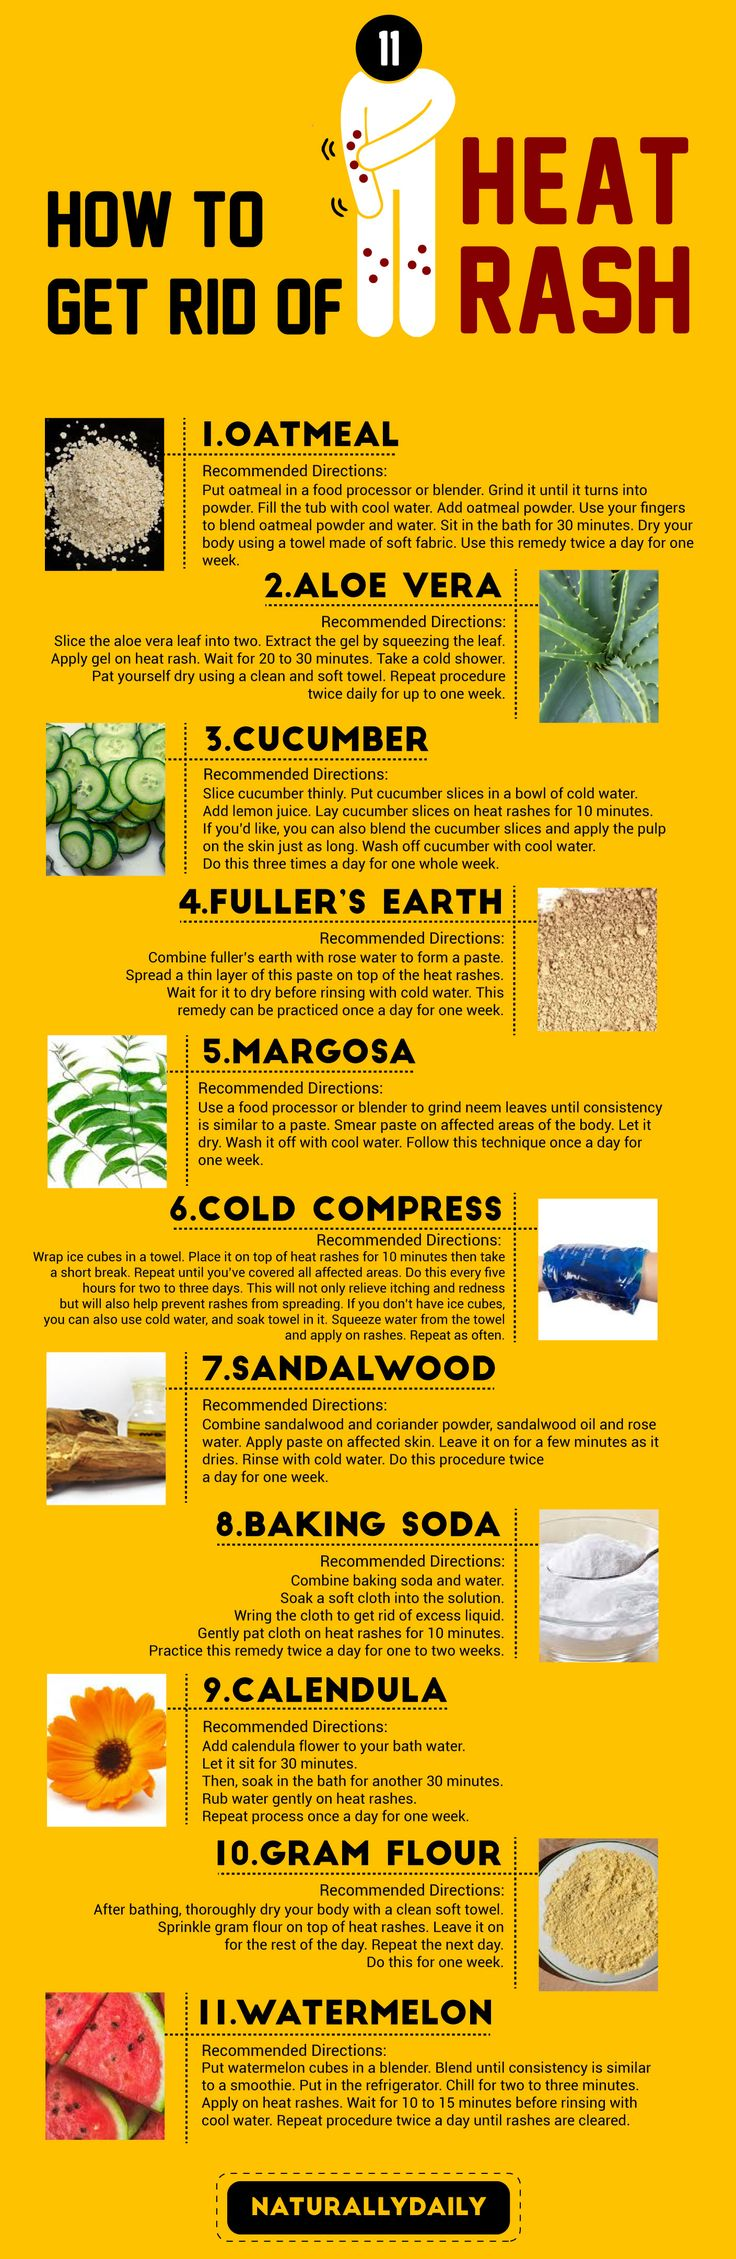 how to get rid of heat rash fast